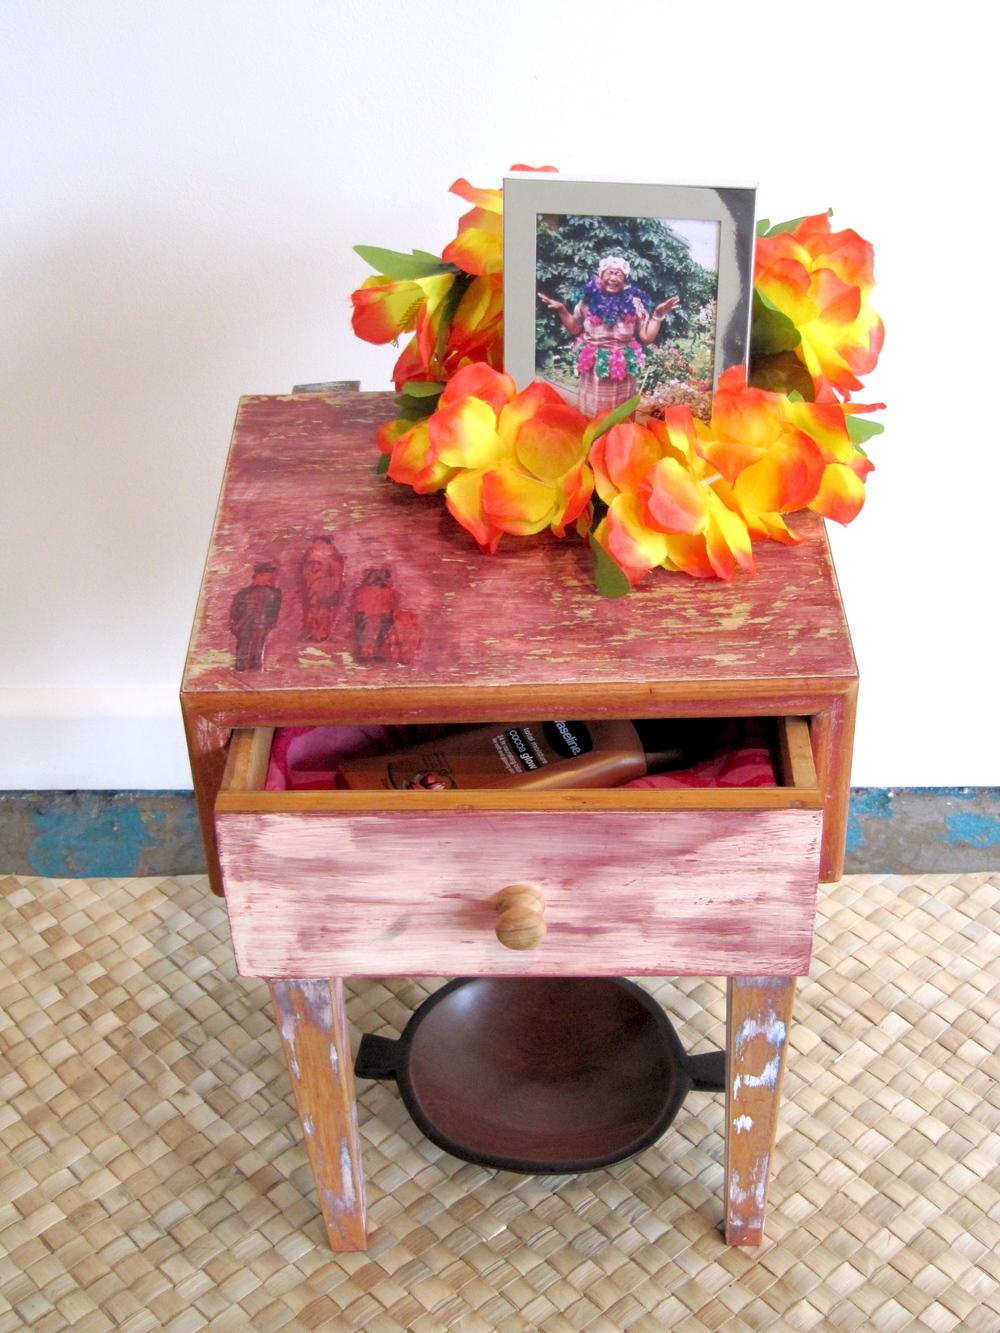 'O 'ie fala mo la'u tinā Nātia | Fine mats for my grandma Nātia (detail), Léuli Eshraghi, pandanus mat, wooden table, tānoa kava bowl, photo frame, 'ula lei, cacao cream, 'ie lavalava, 2012